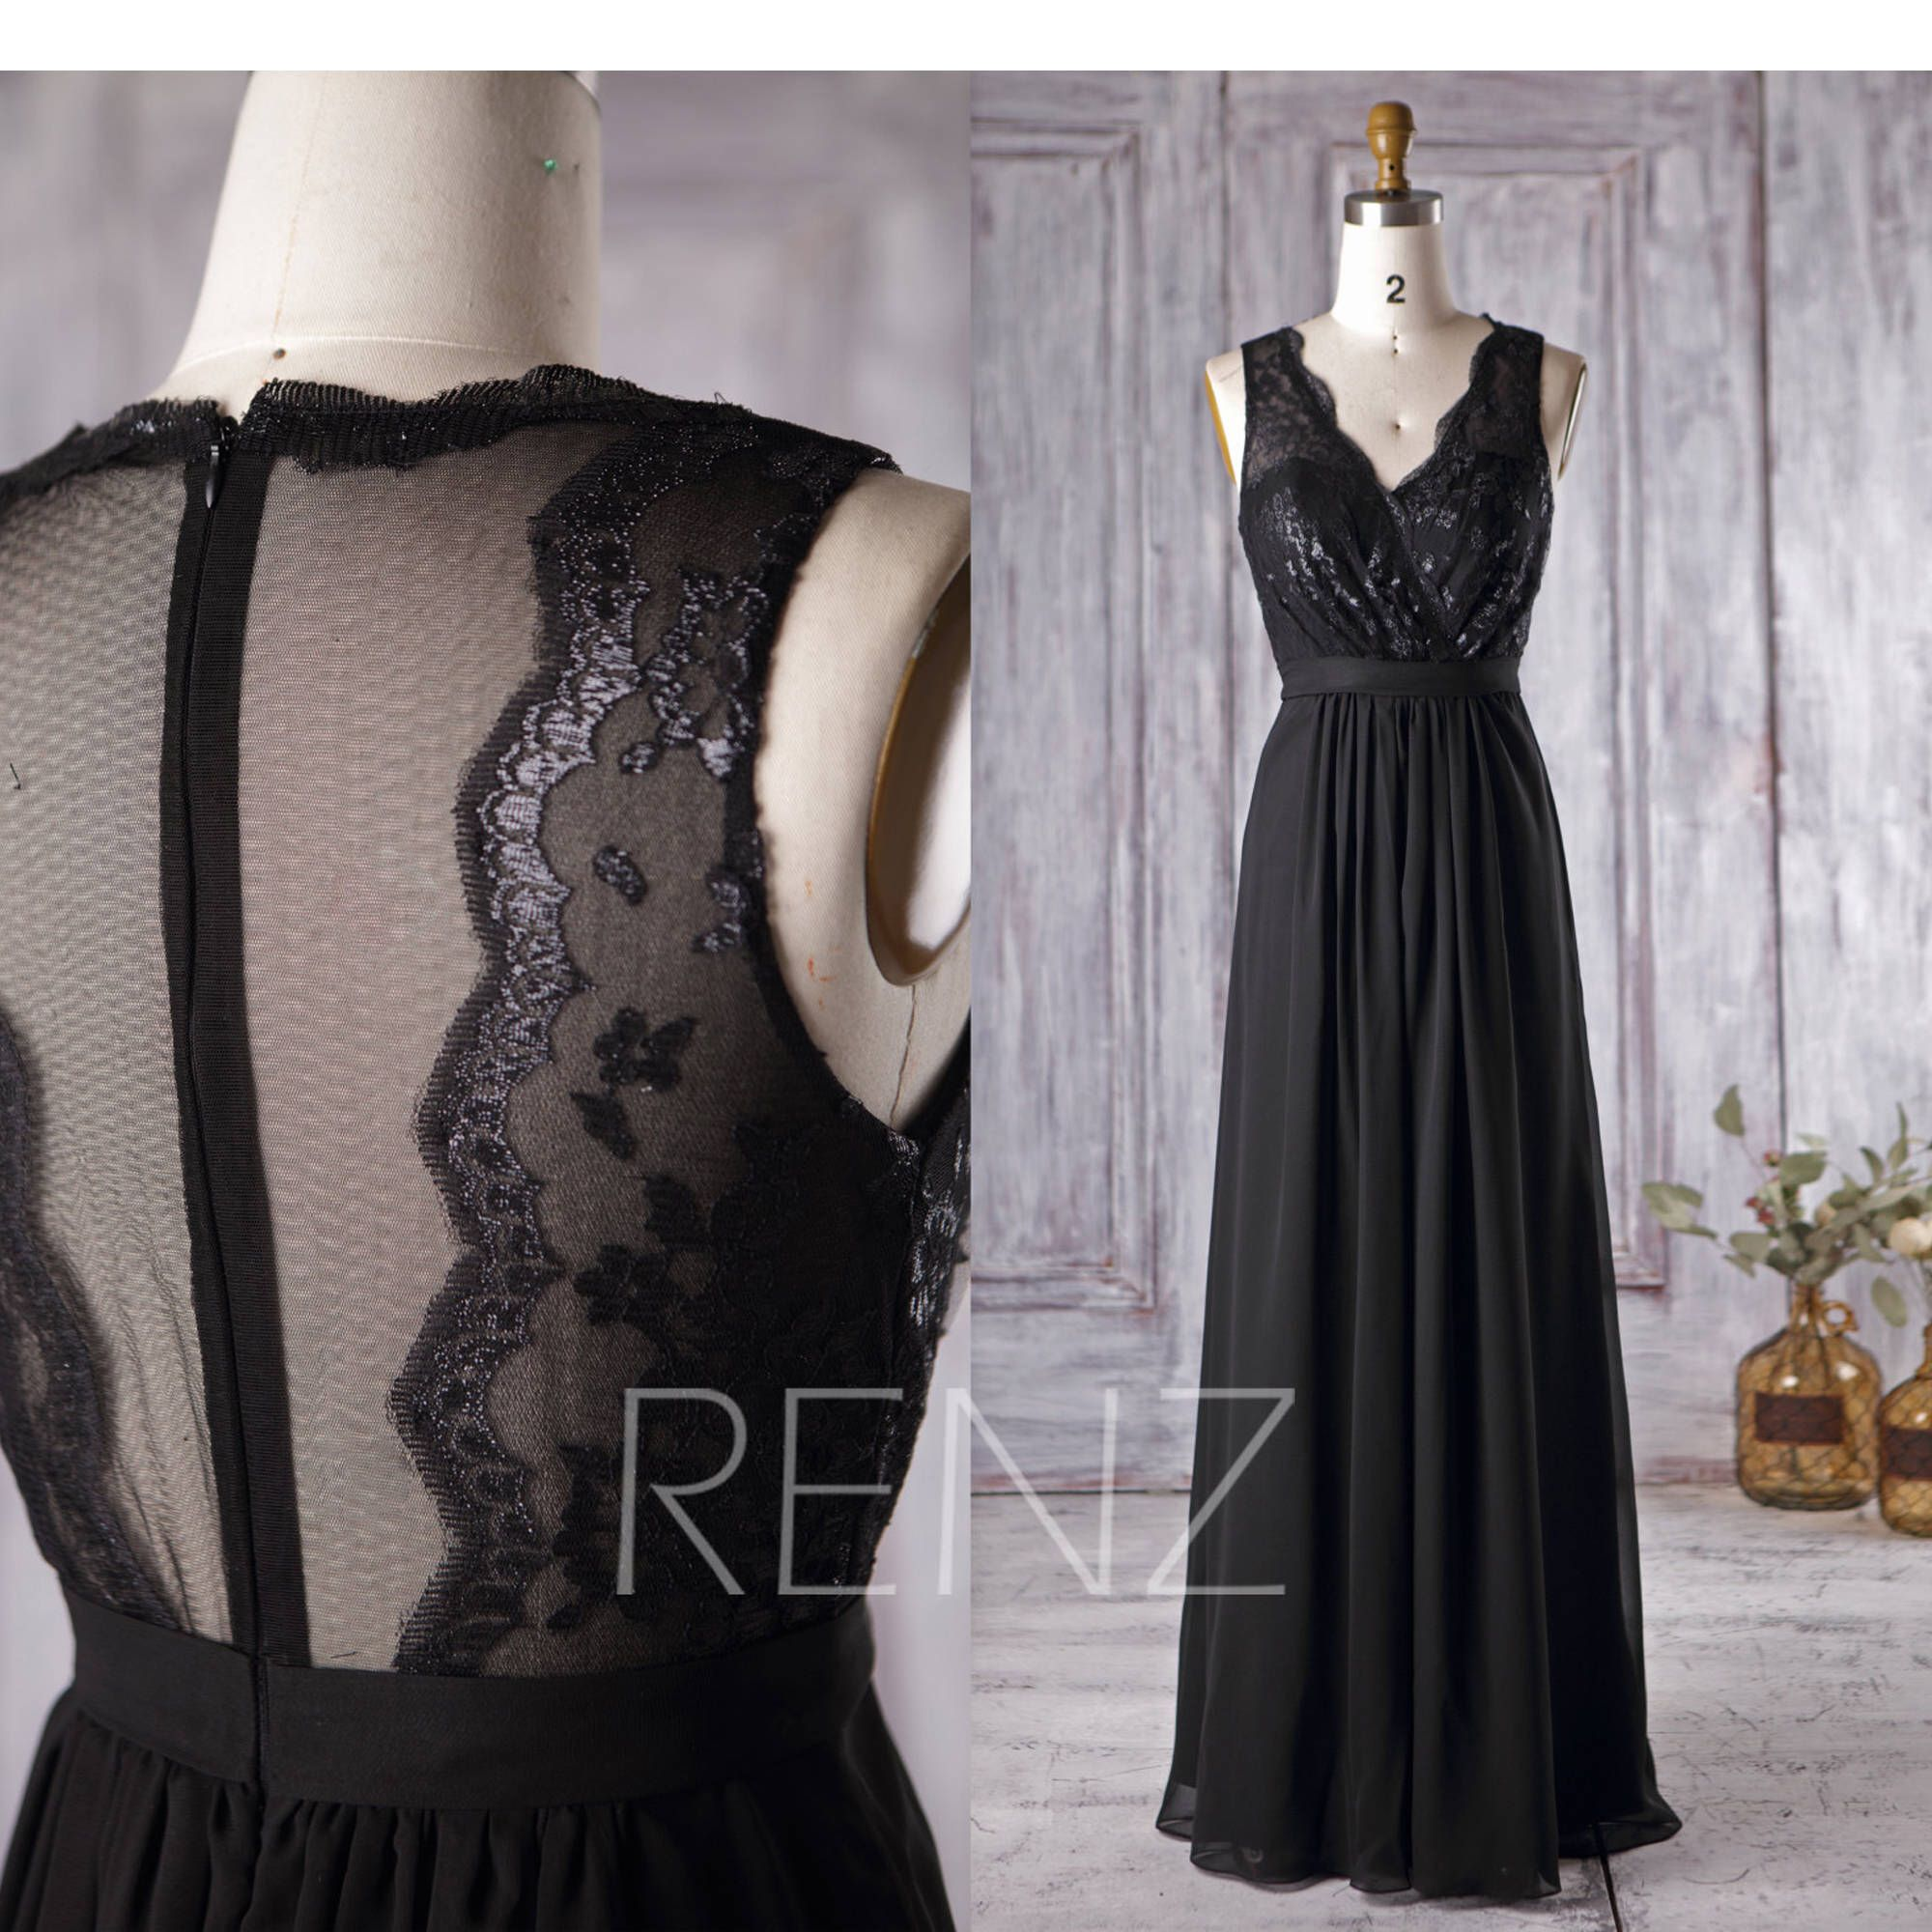 Black Chiffon Bridesmaid Dress V Neck Lace Wedding Dress Long Illusion Neck Prom Black Chiffon Bridesmaid Dresses Long Wedding Dresses Wedding Dress Necklace